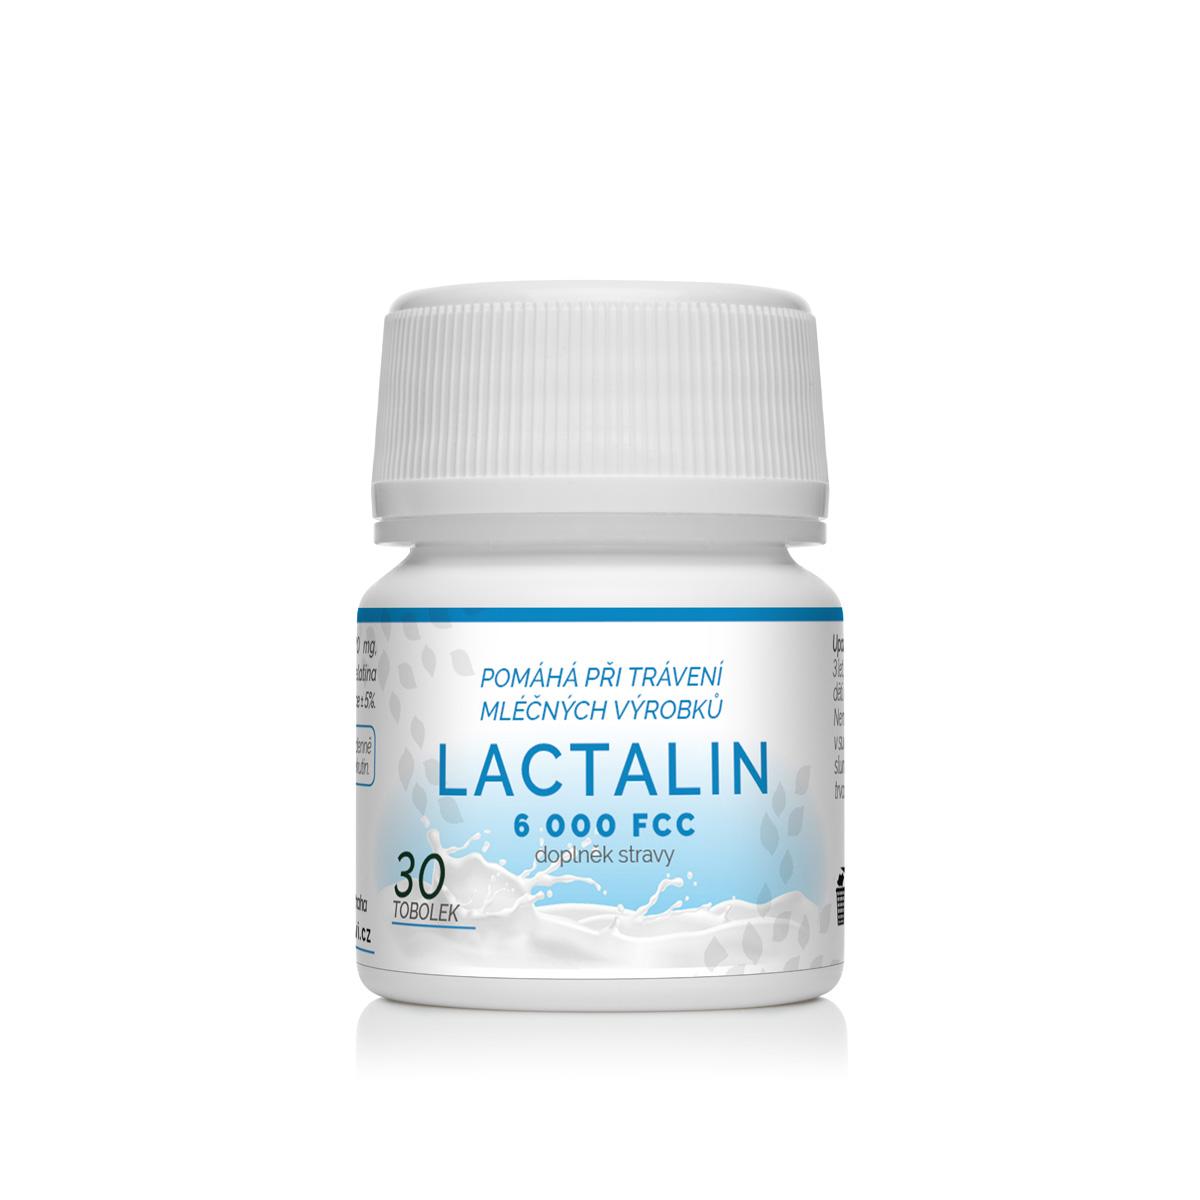 Lactalin 6000 FCC 30 cps